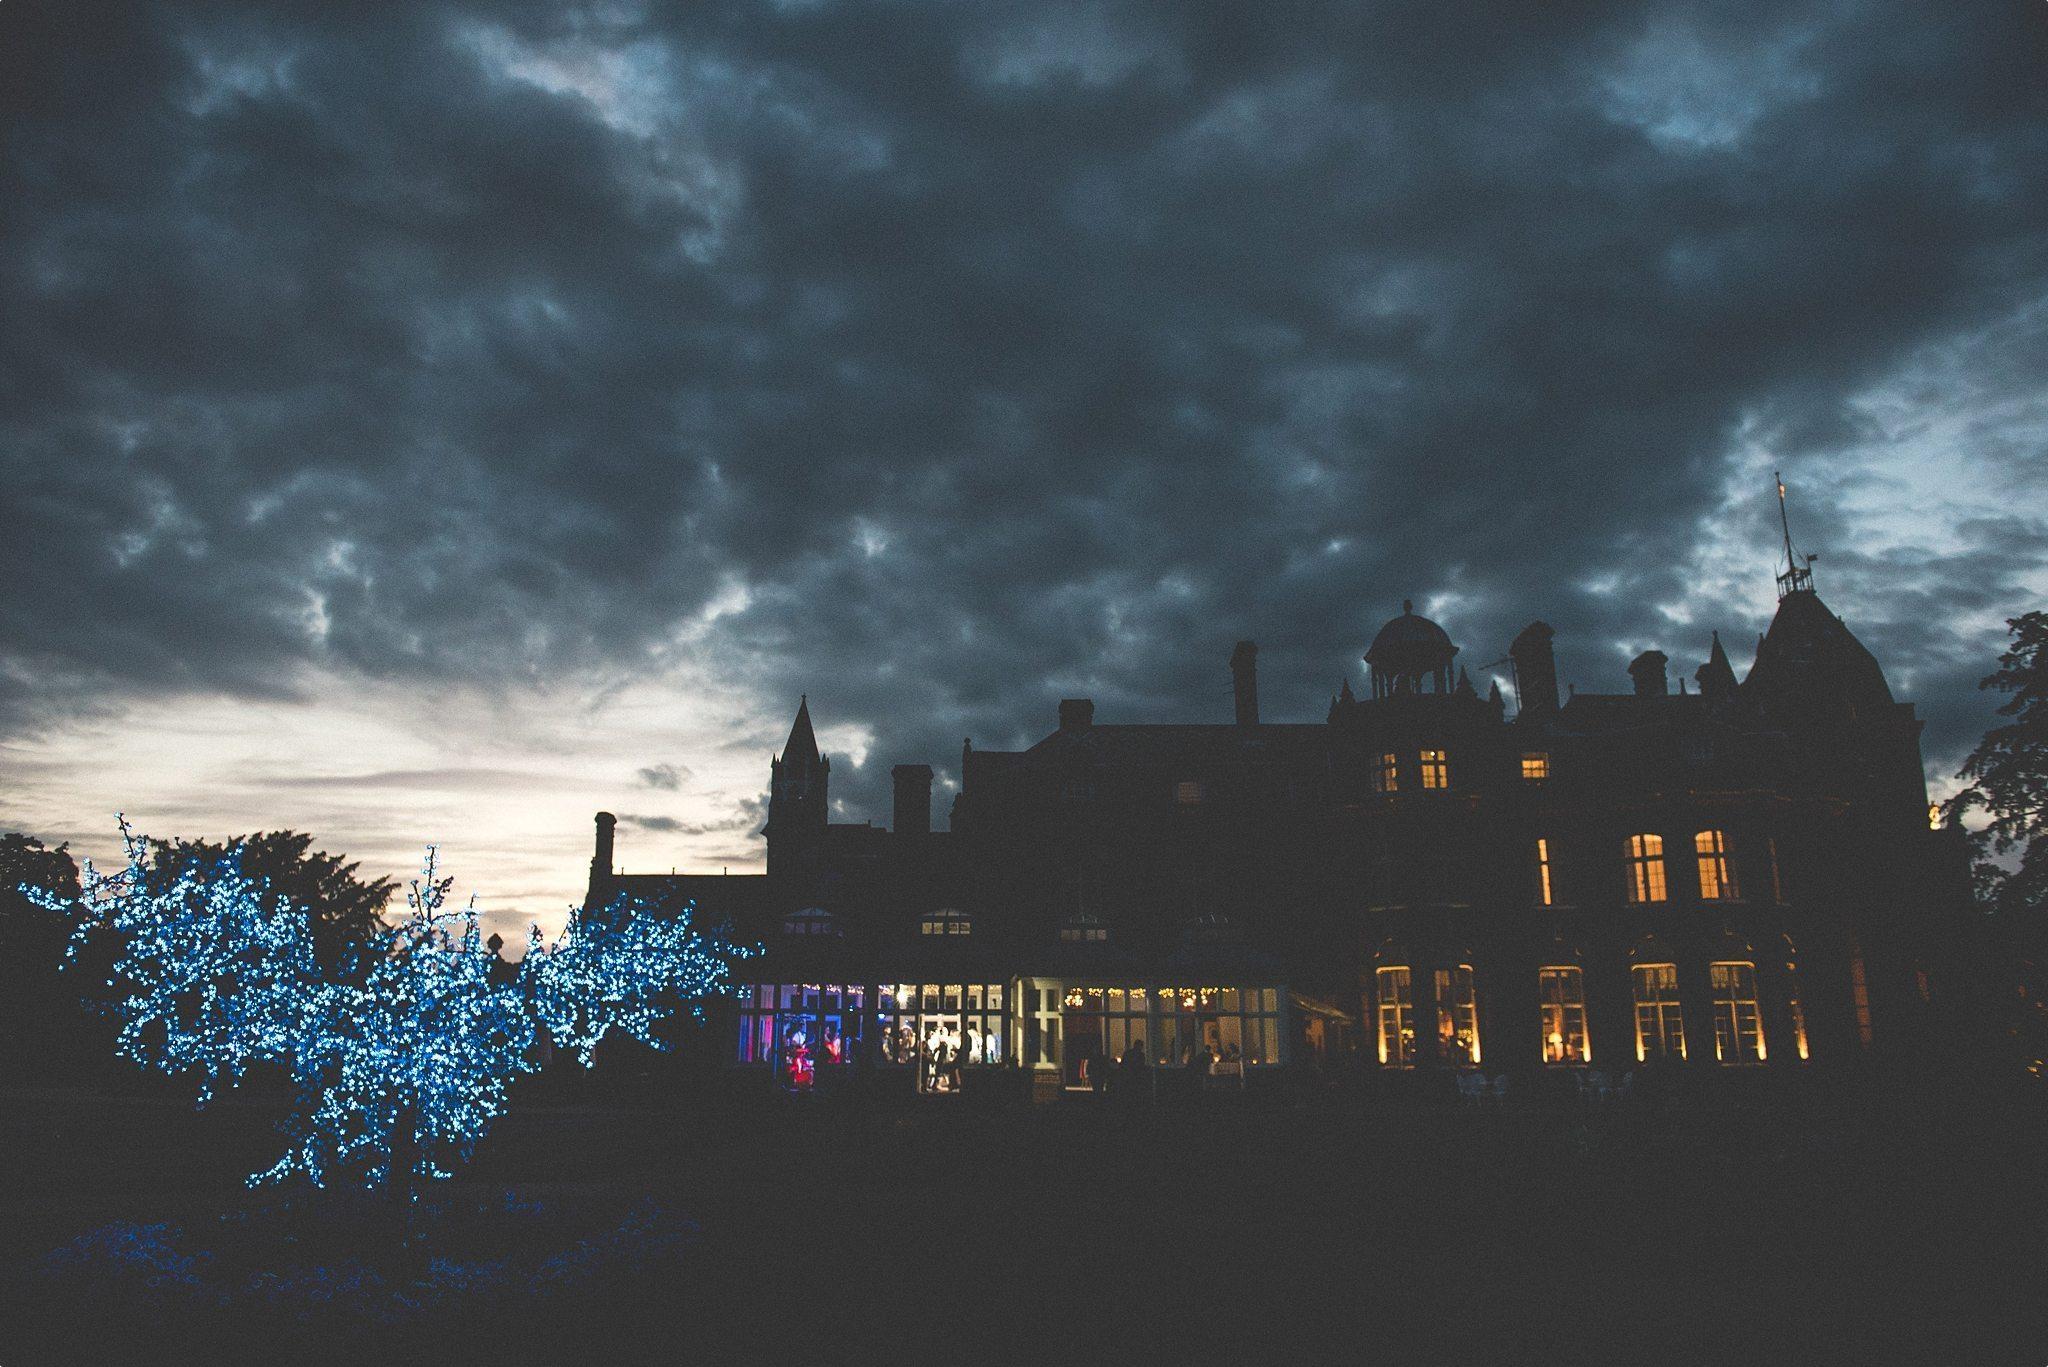 Elvetham Hotel at Night